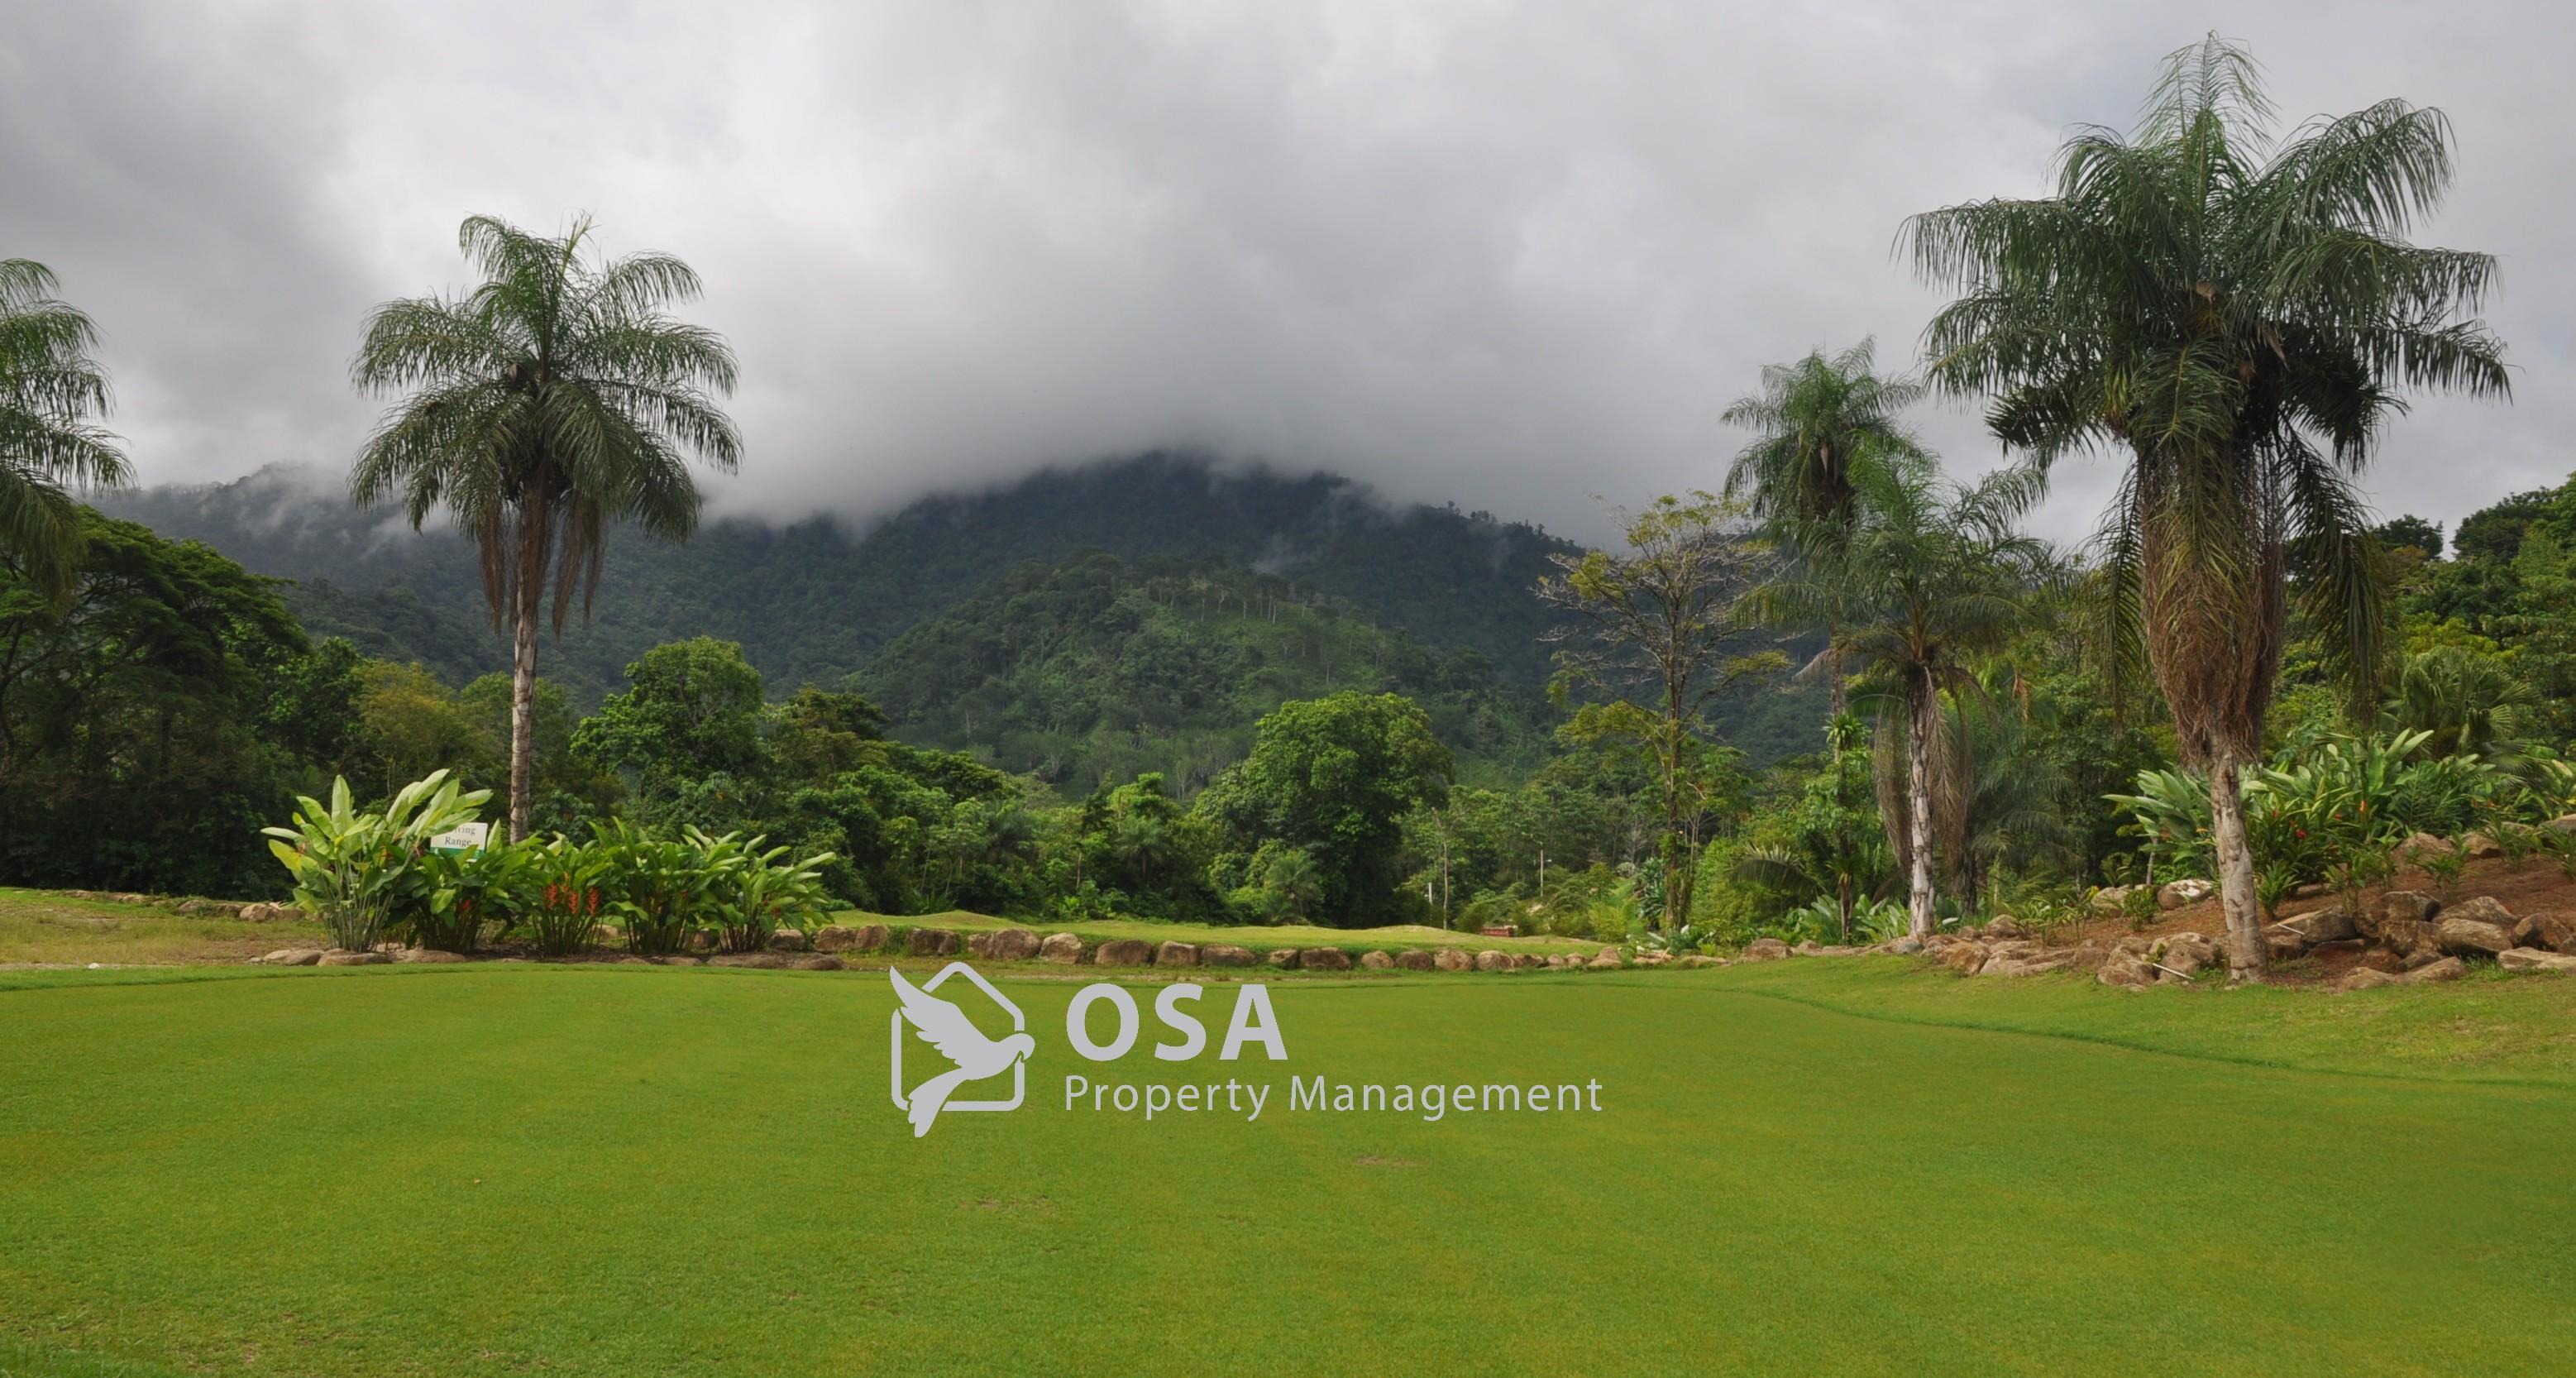 san buenas golf resort cloudy